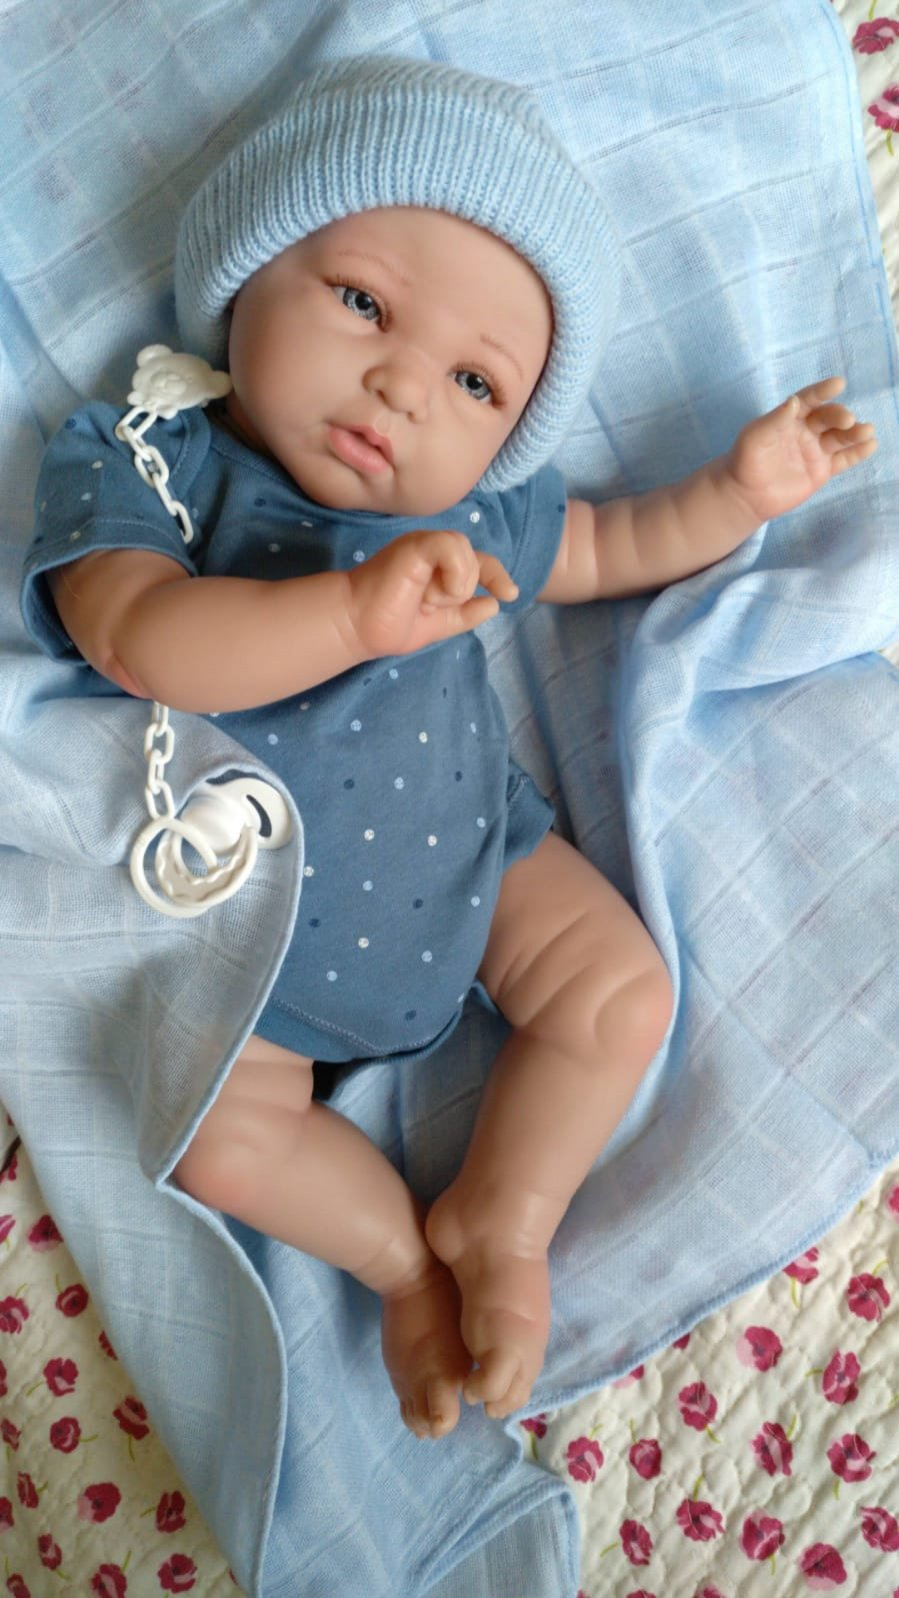 muñecas reborn para niñas